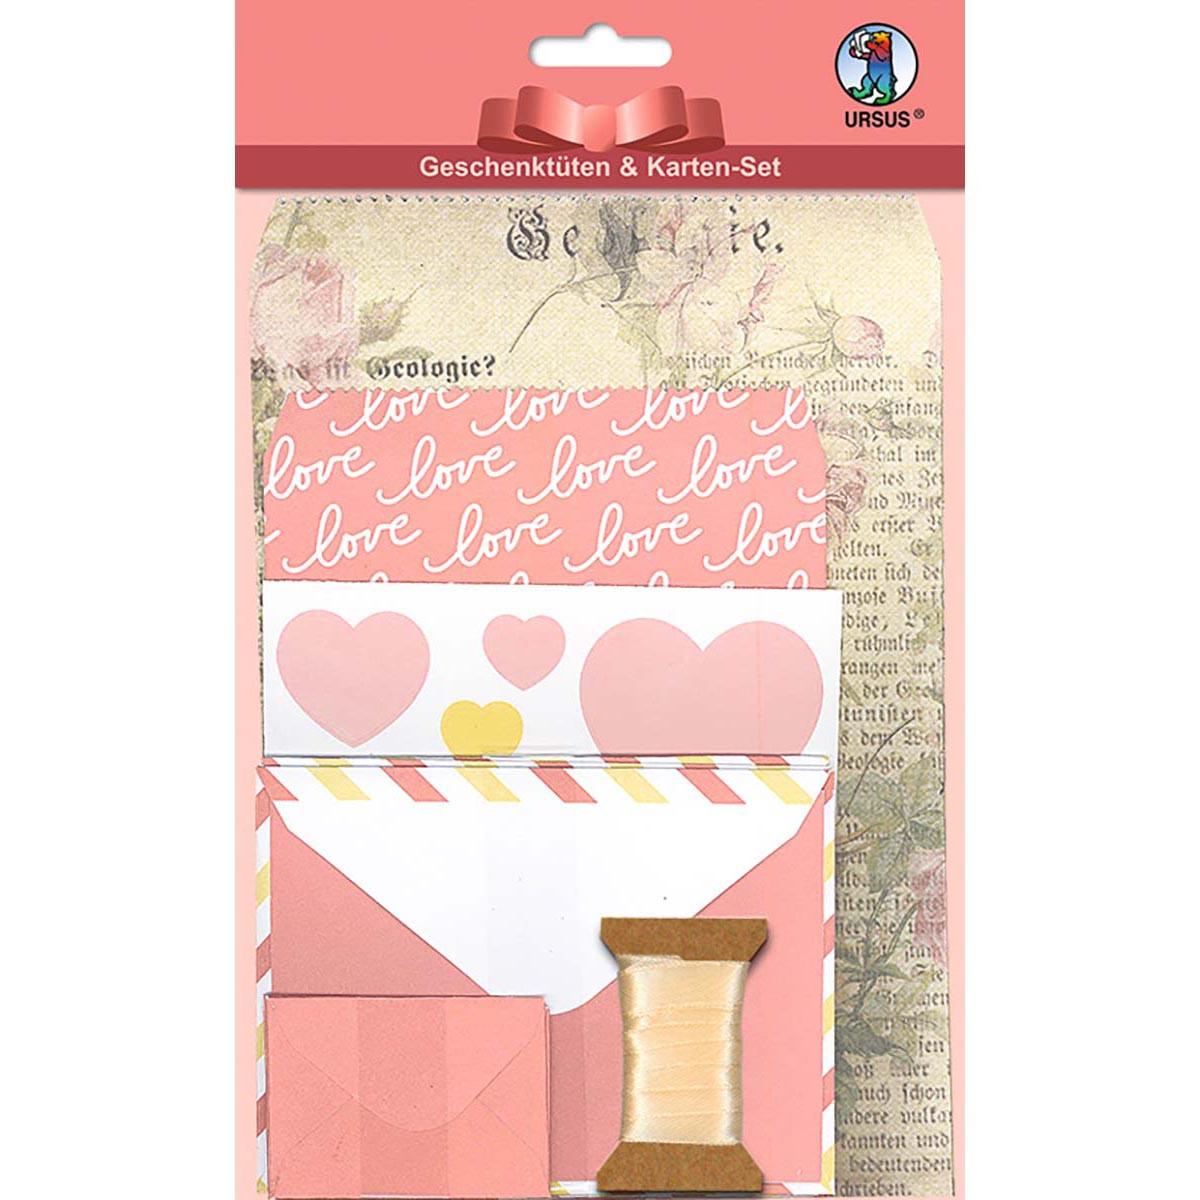 "Geschenktüten-Karten-Set ""Romance"""